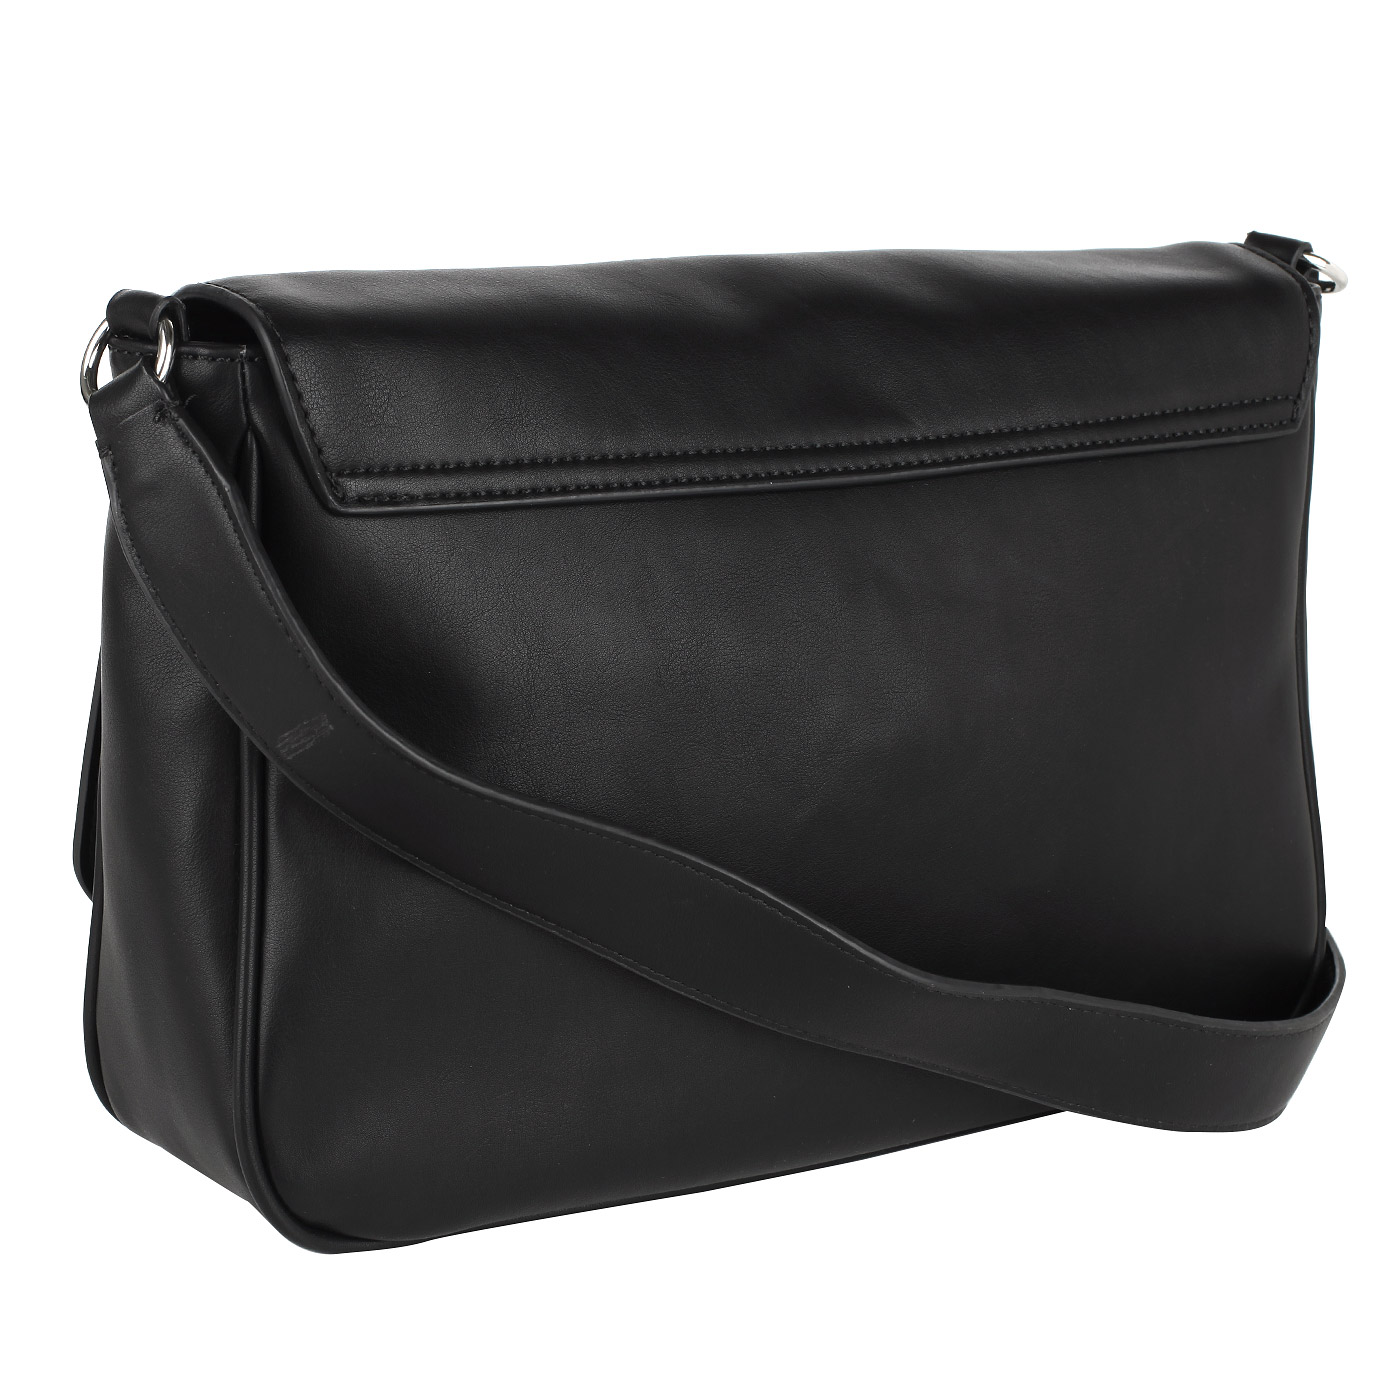 088a621d576f Женская черная сумка с брелоком в форме сердечка Guess Bradyn HWVY66 ...